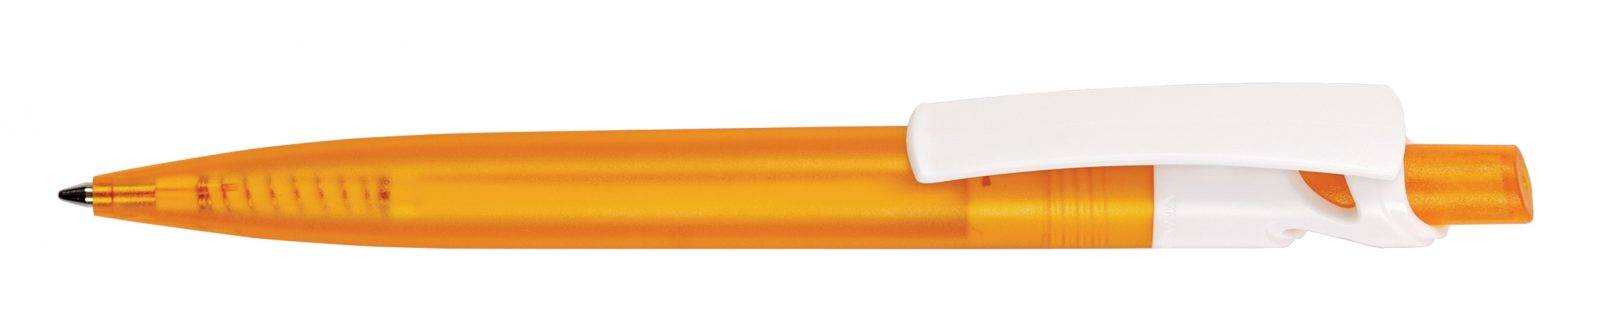 Pix Maxx orange invelis antibacterian print 360 grade tampografie | Toroadv.ro